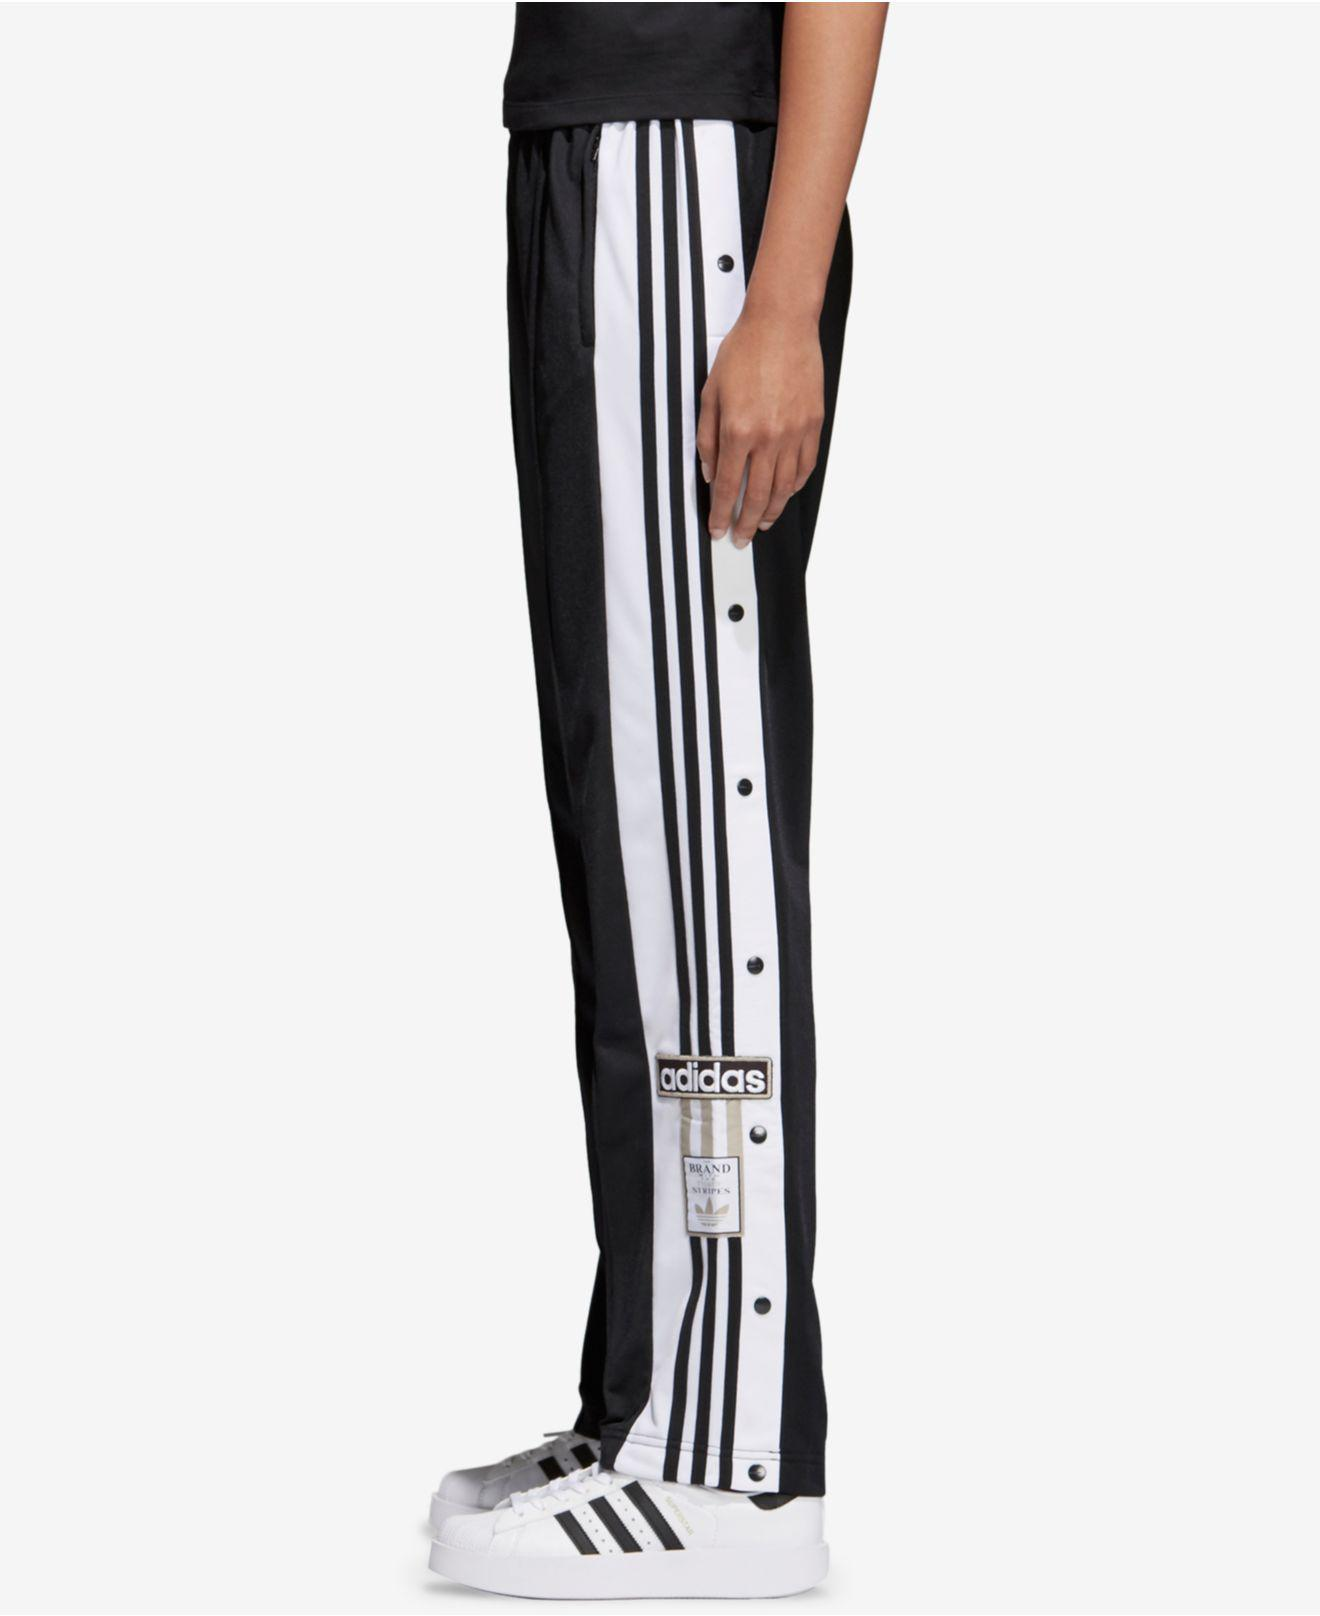 Adidas - Black Originals Adibreak Track Pants - Lyst. View fullscreen 93579db2ae9d